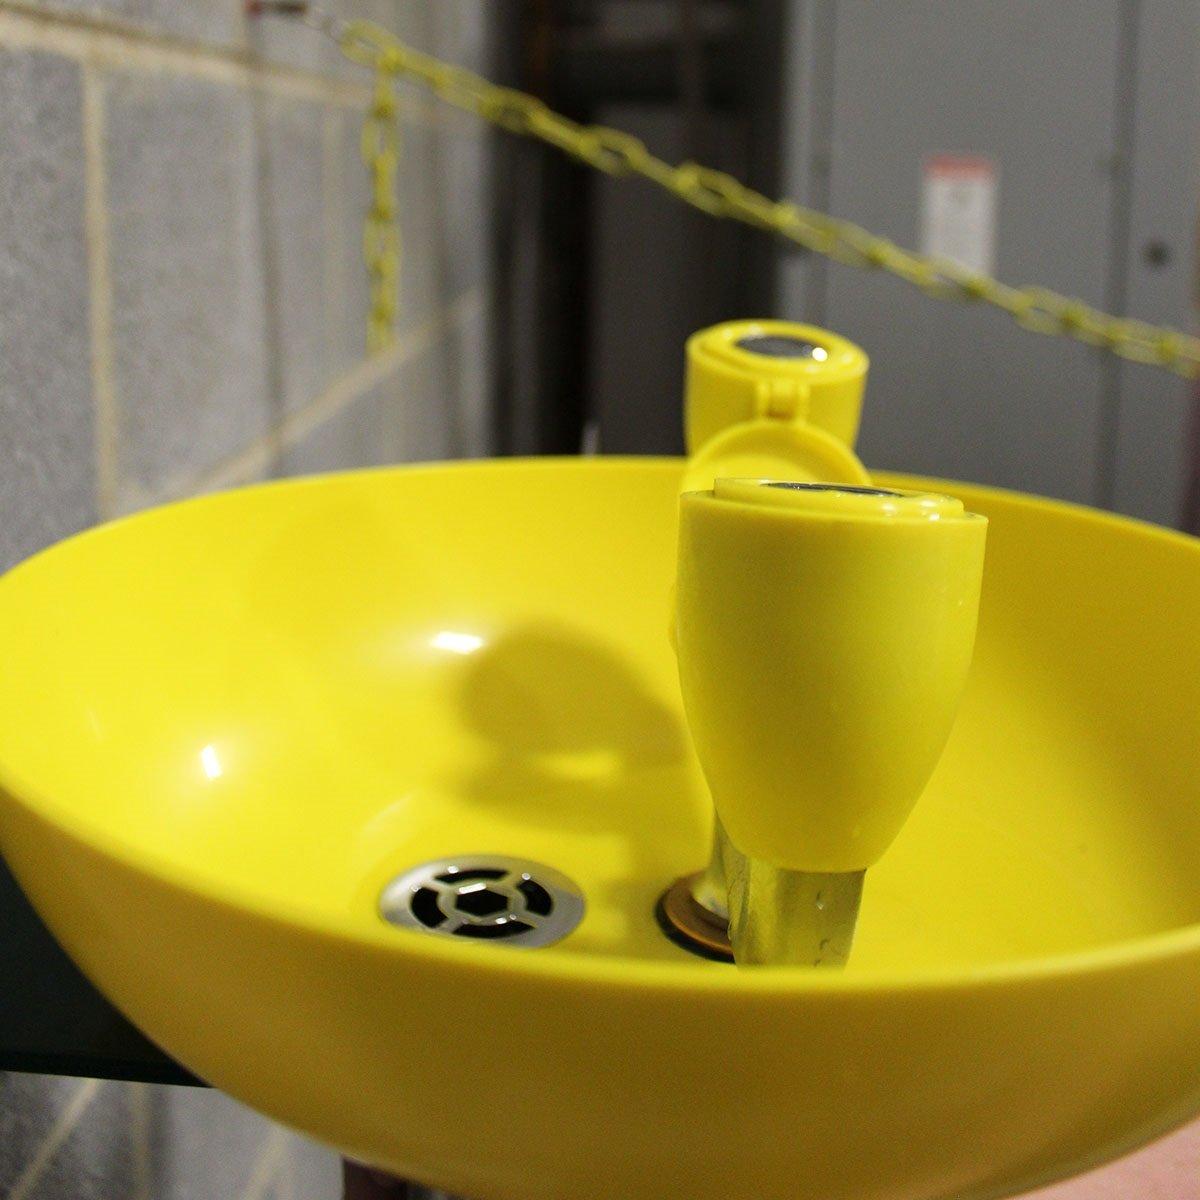 Speakman Traditional Series SE-580 Wall Mounted Eyewash with Plastic Bowl by Speakman (Image #2)